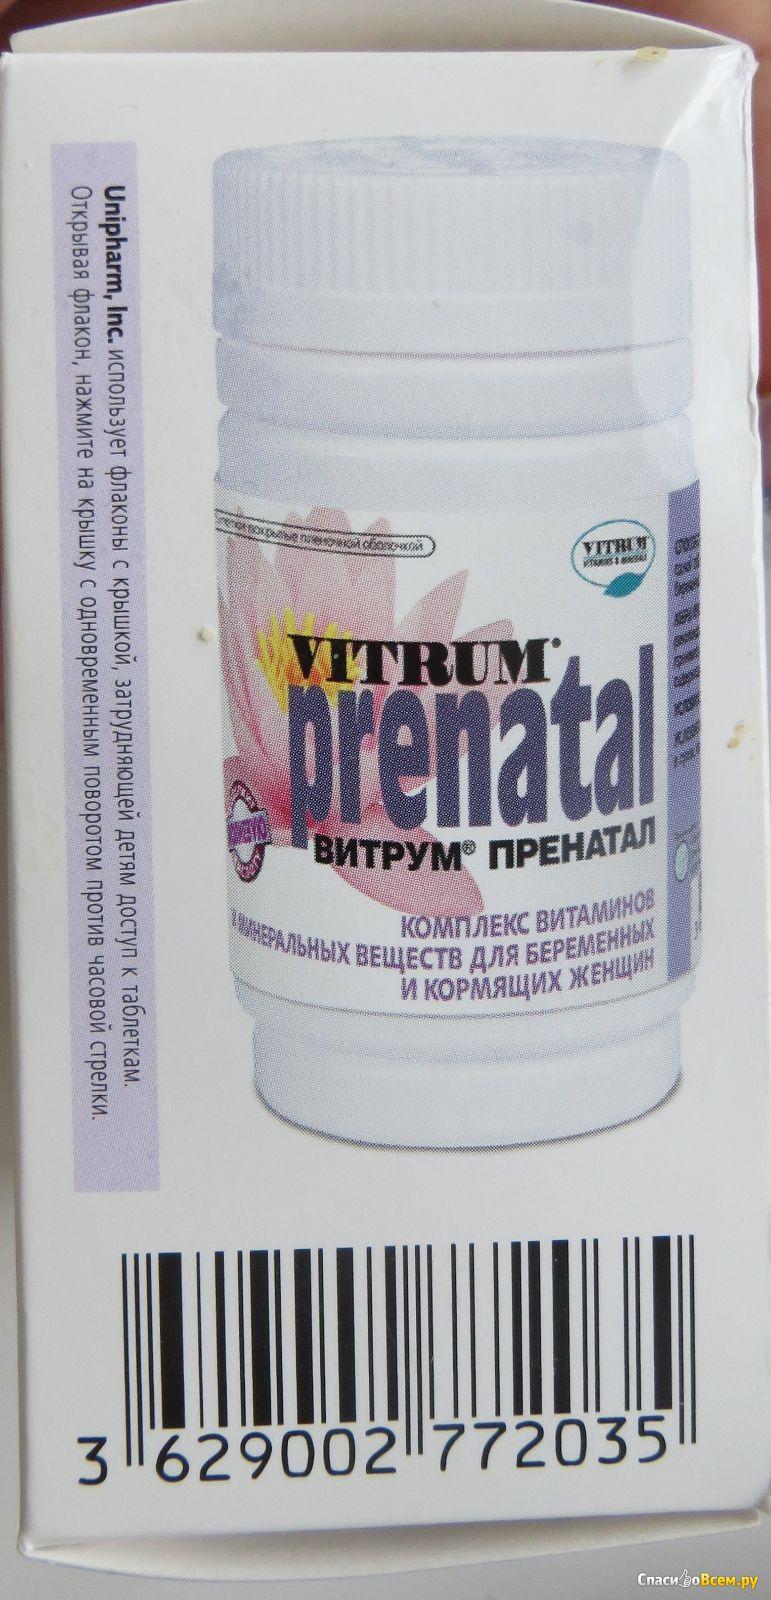 Пренатал для беременных цена